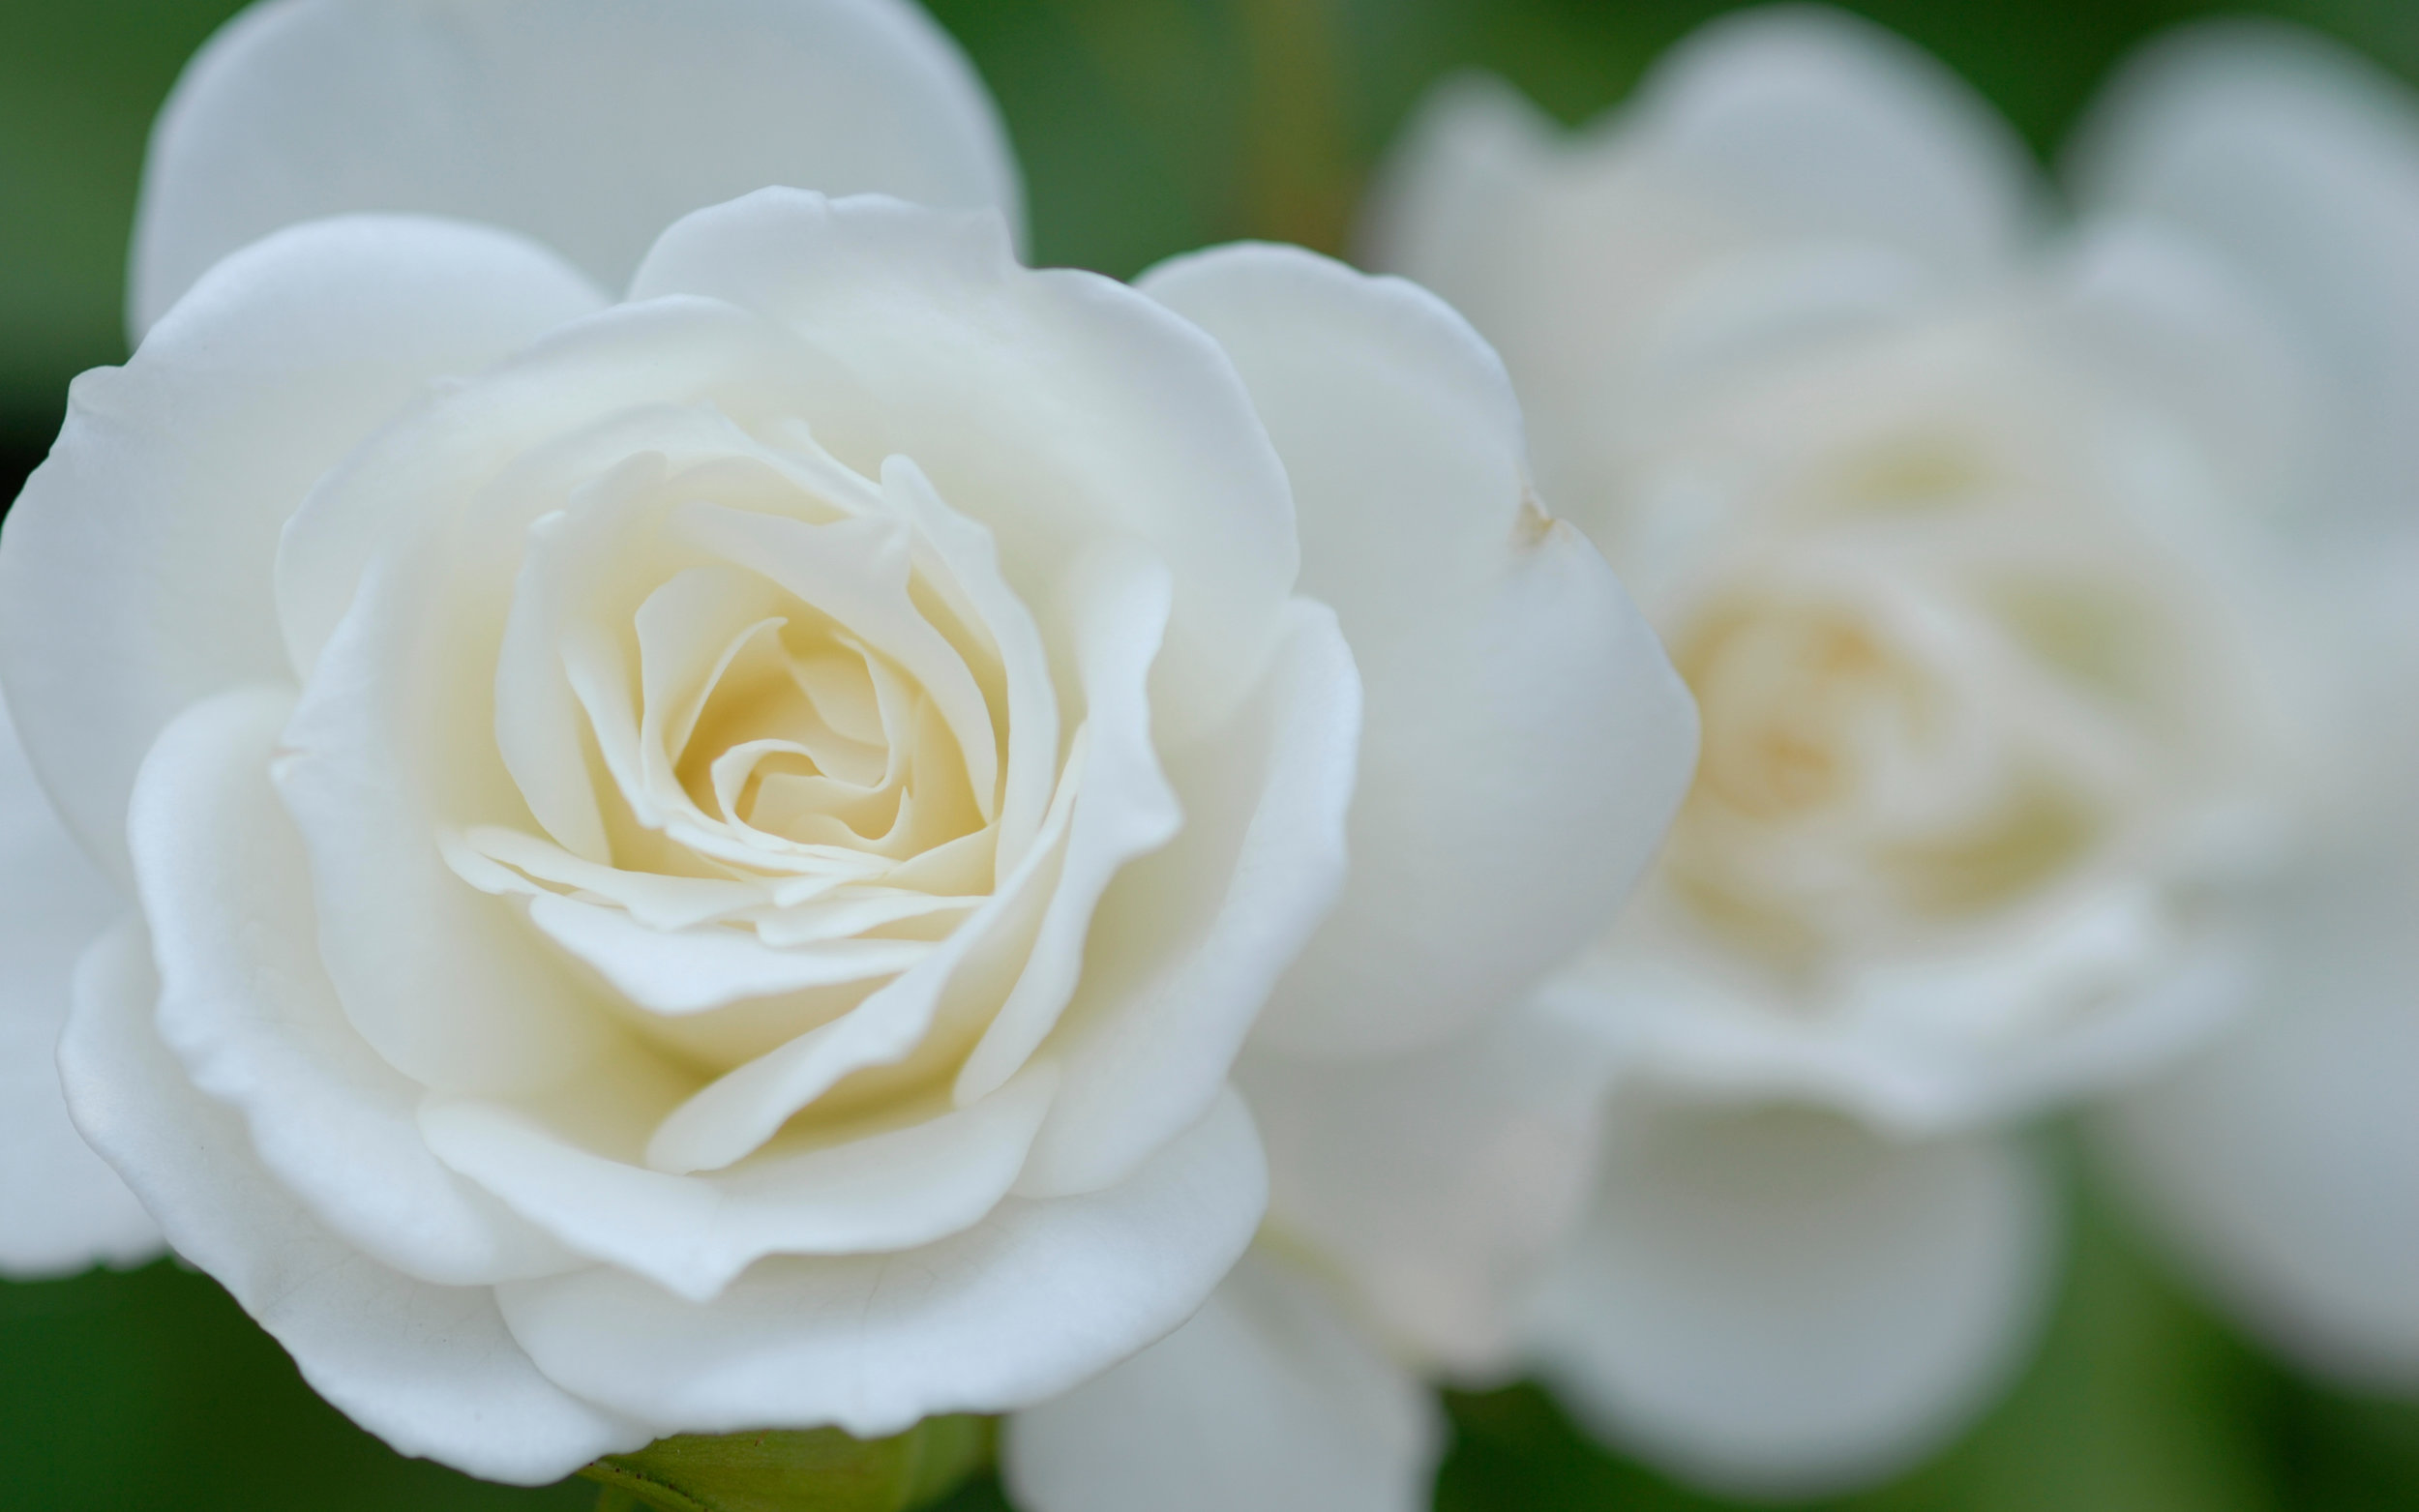 white-rose-wallpaper-background-10513-10934-hd-wallpapers.jpg